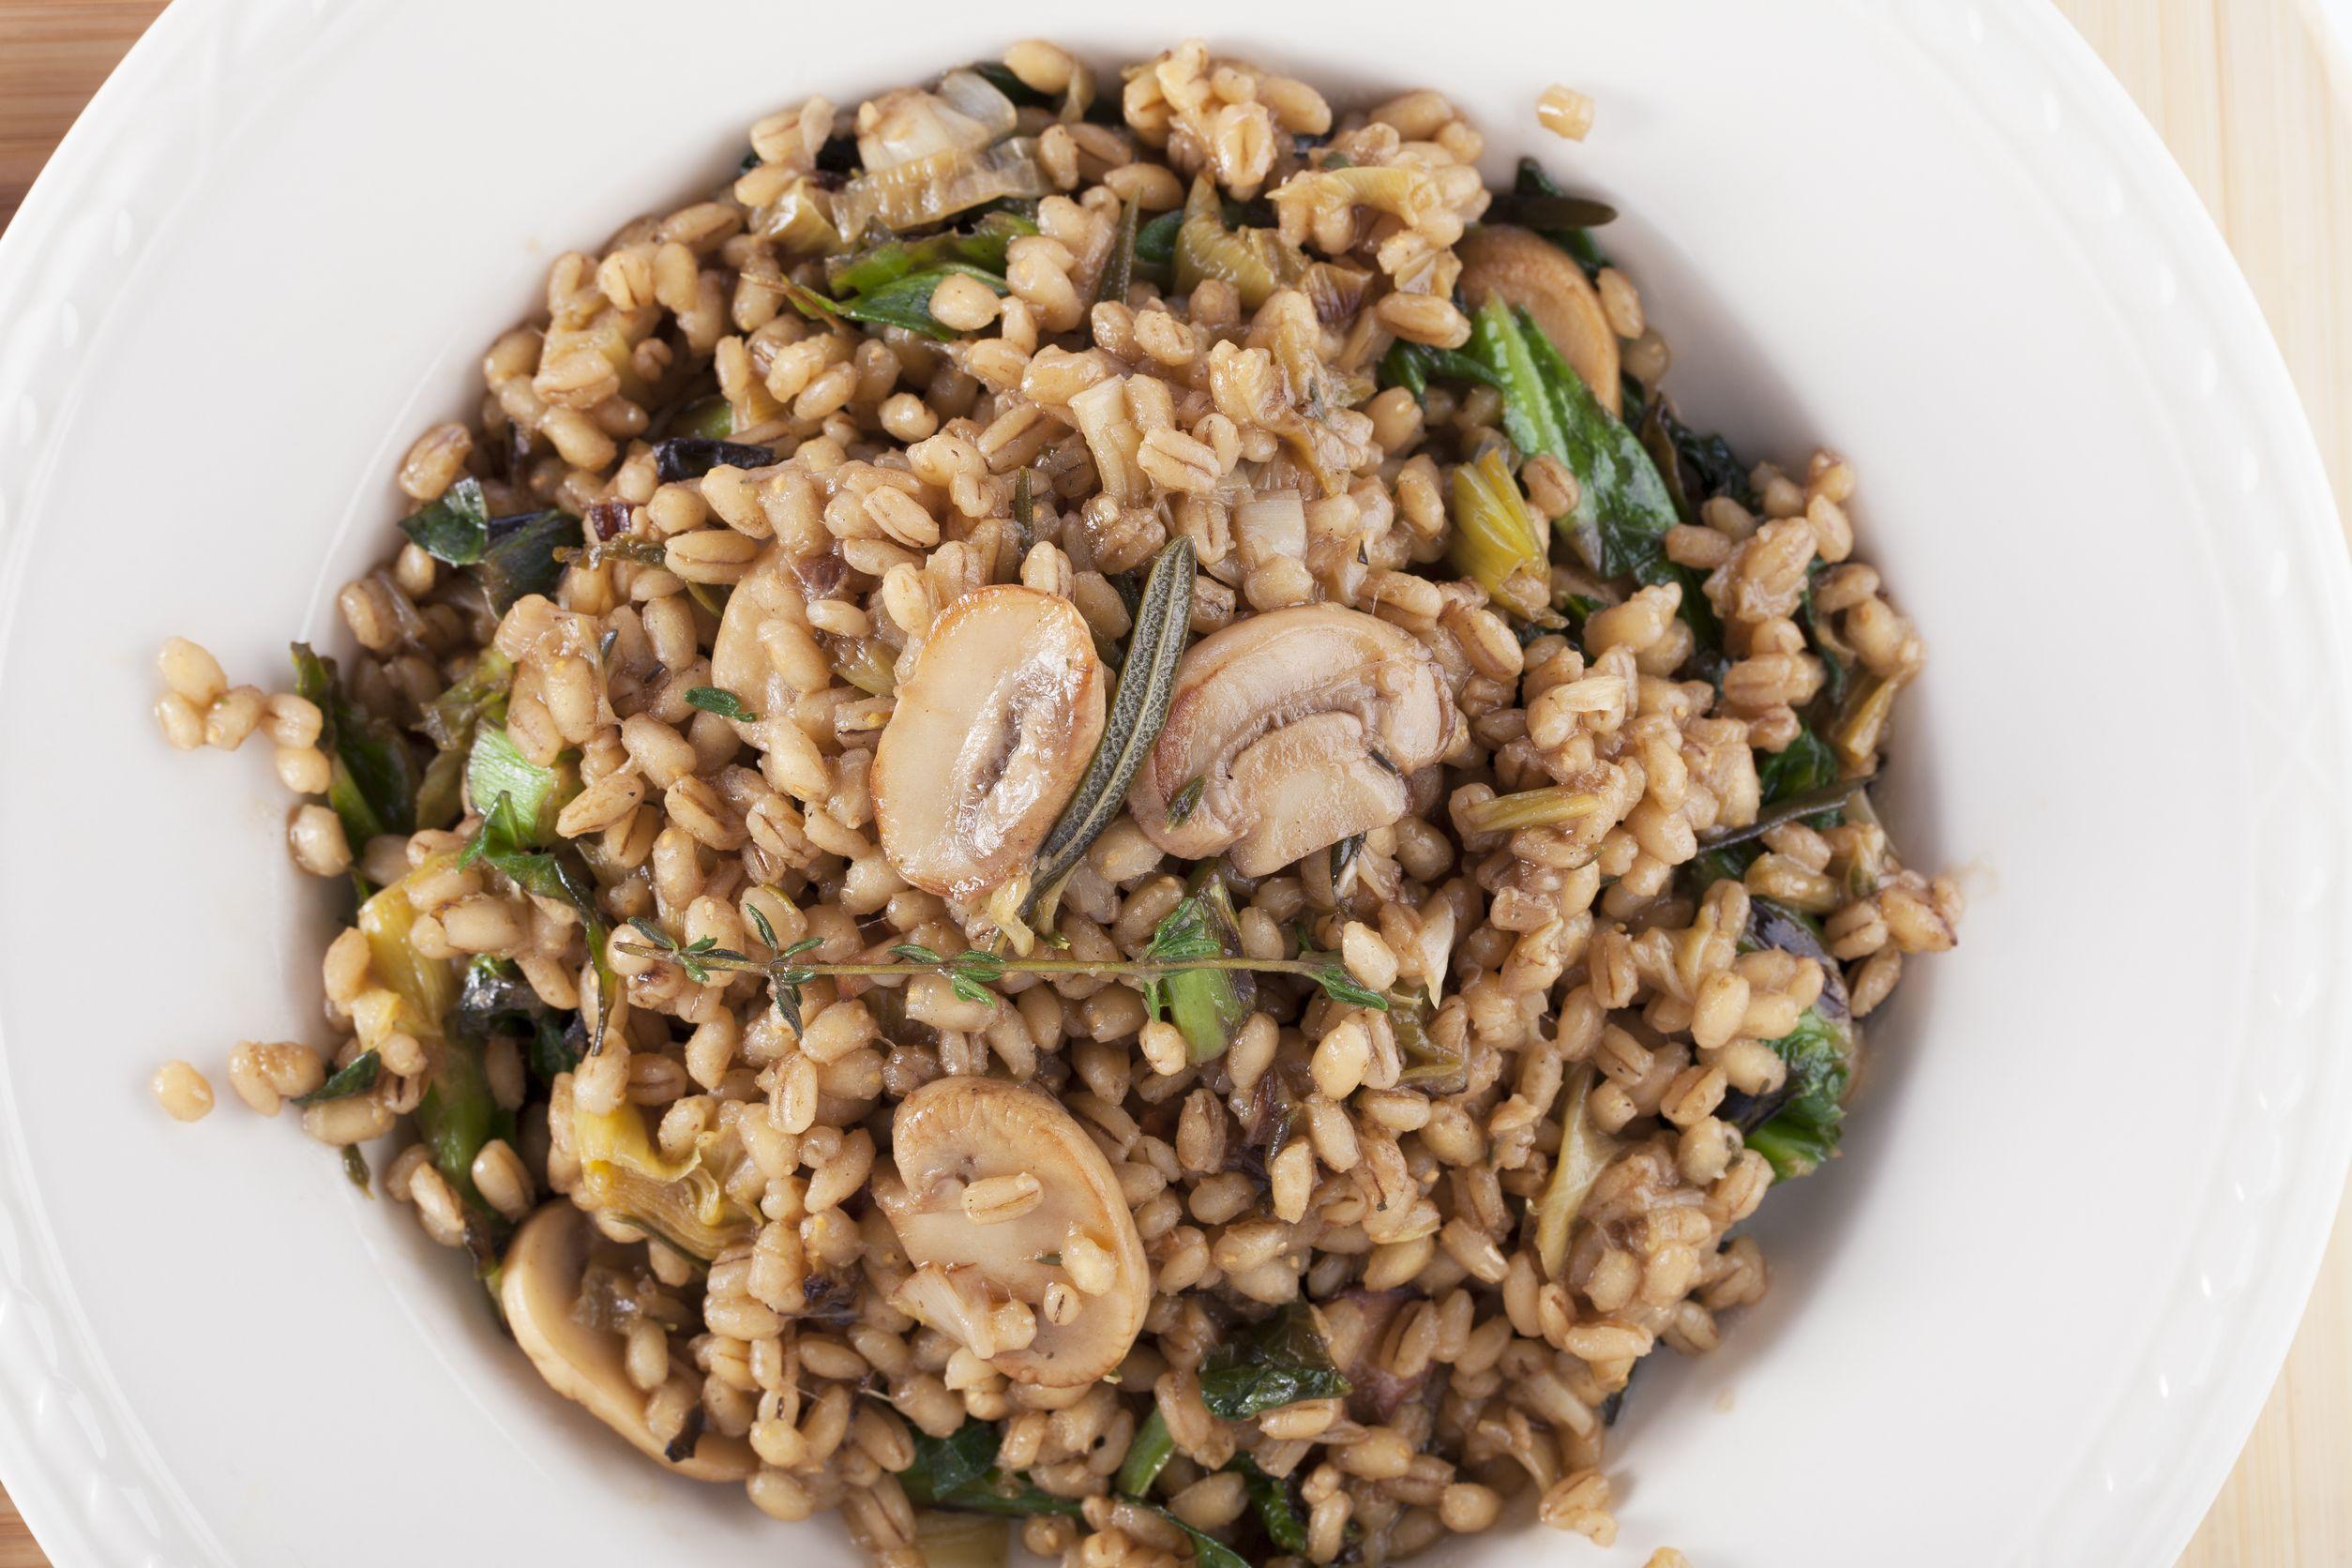 ... Dinner Recipe: Creamy Sage & Mushroom Barley Risotto - 12 Tomatoes